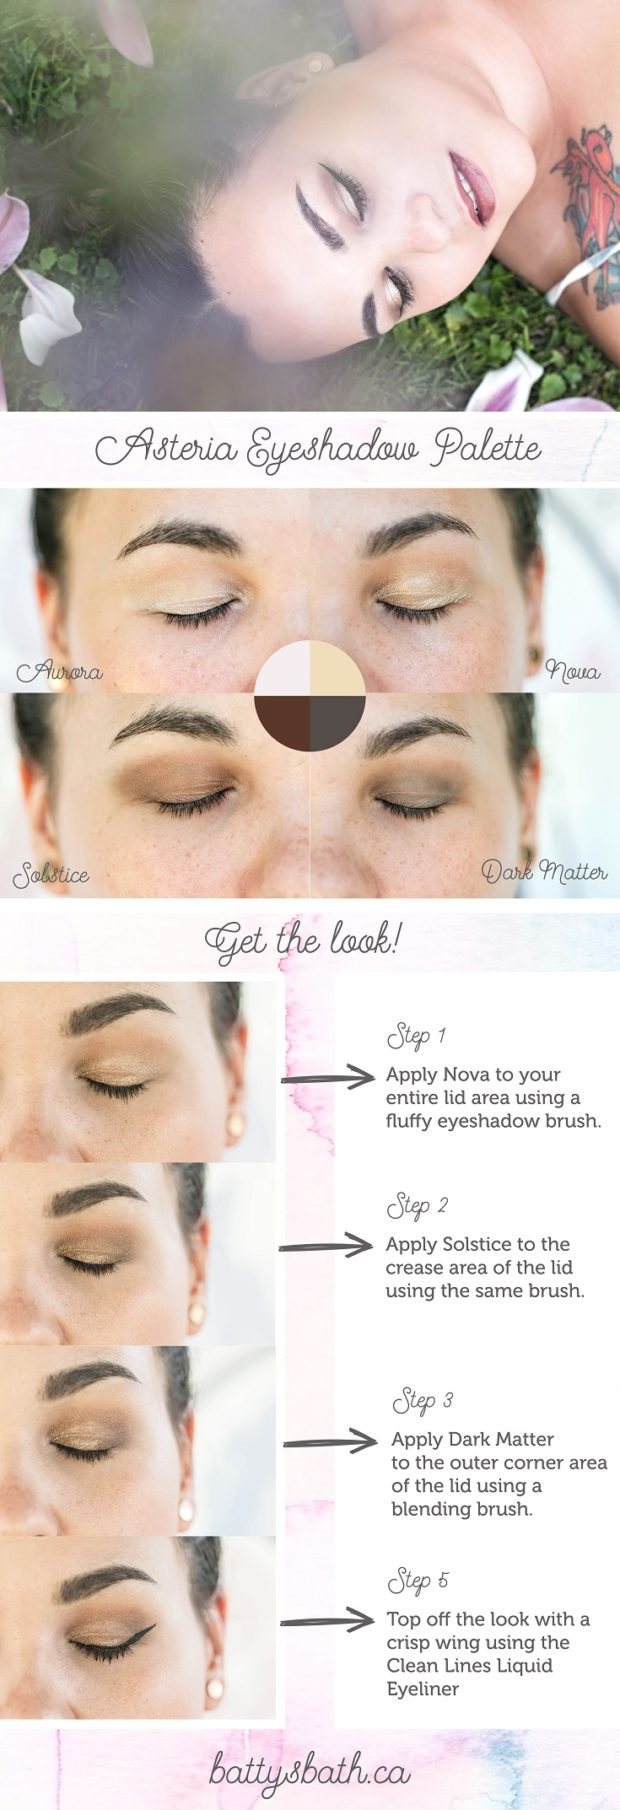 asteria eyeshadow palette